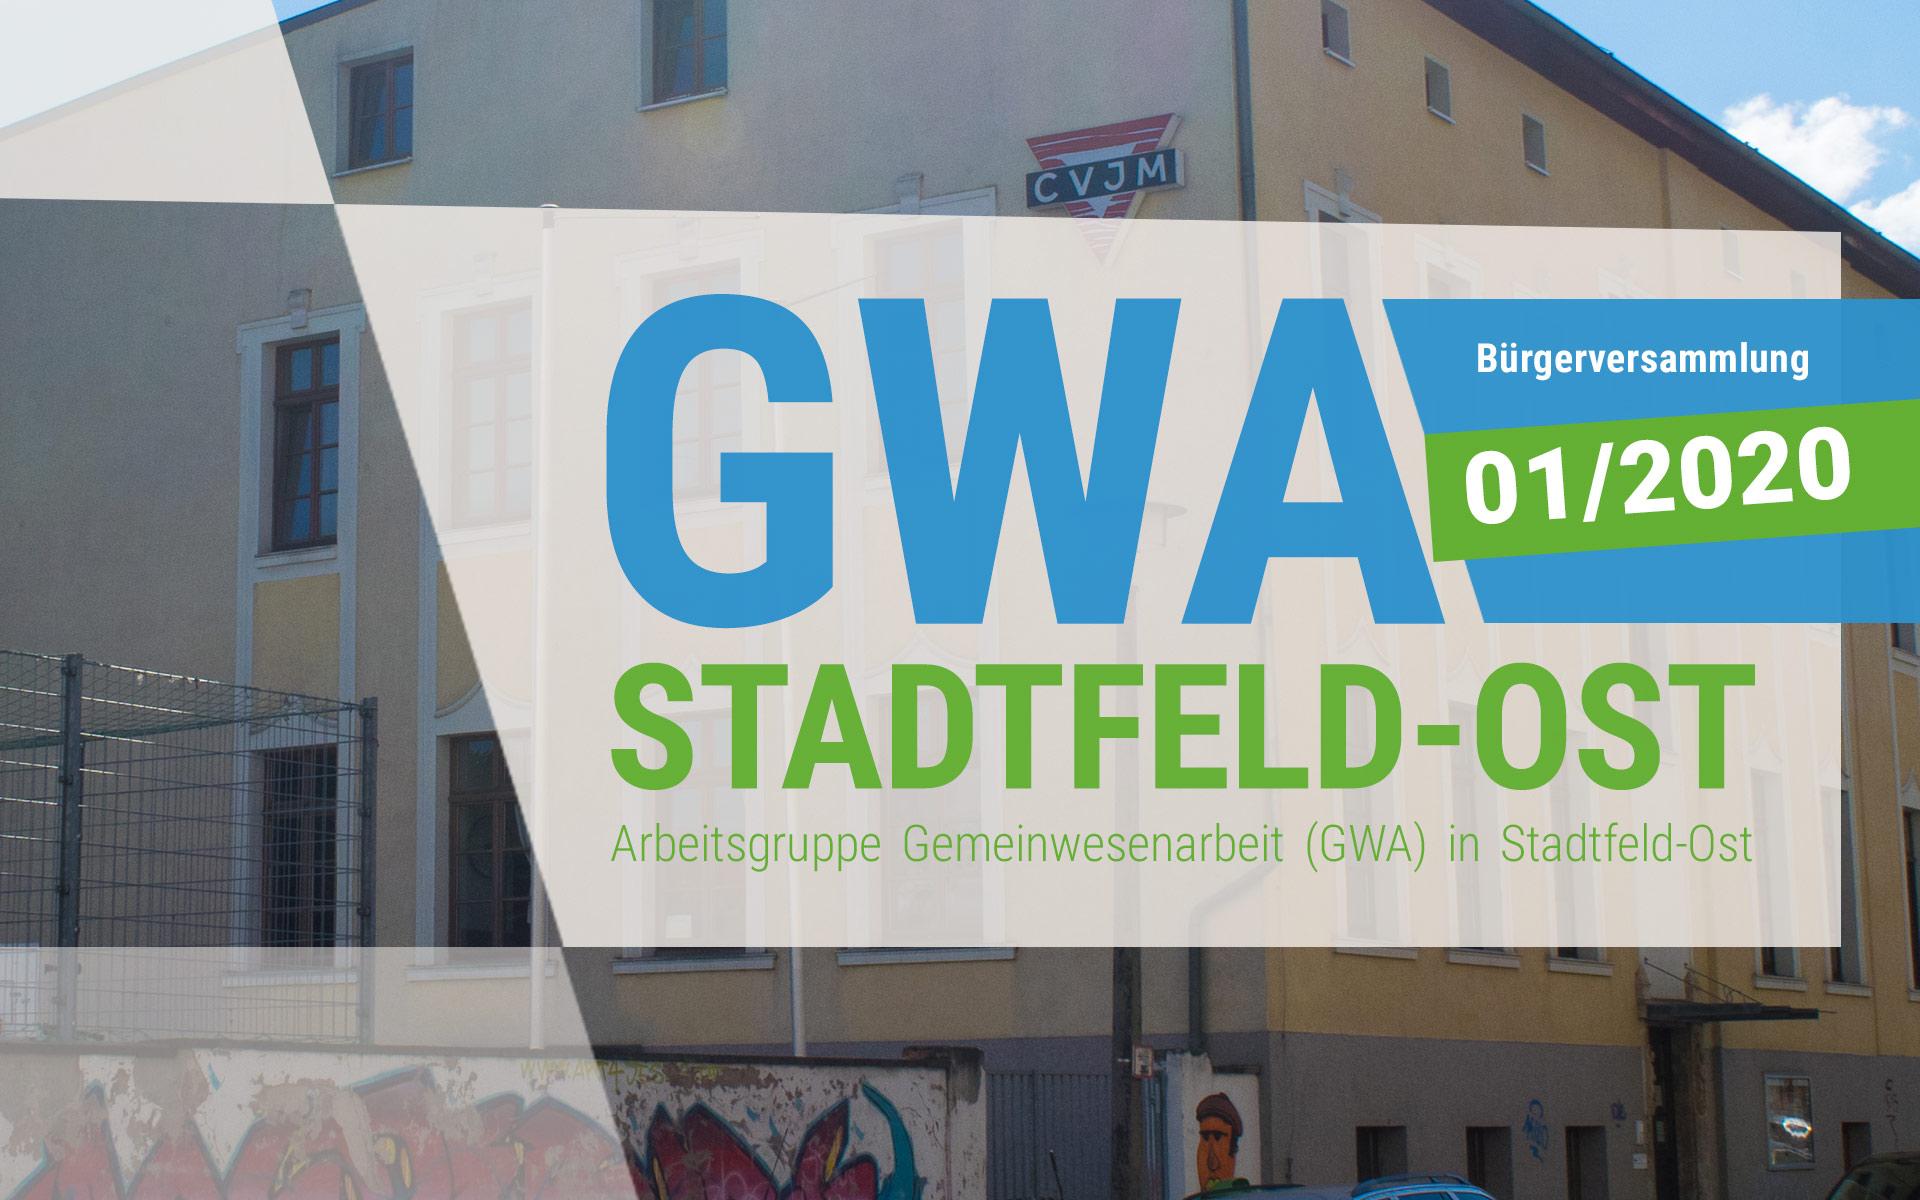 Versammlung der GWA Stadtfeld-Ost 01/2020